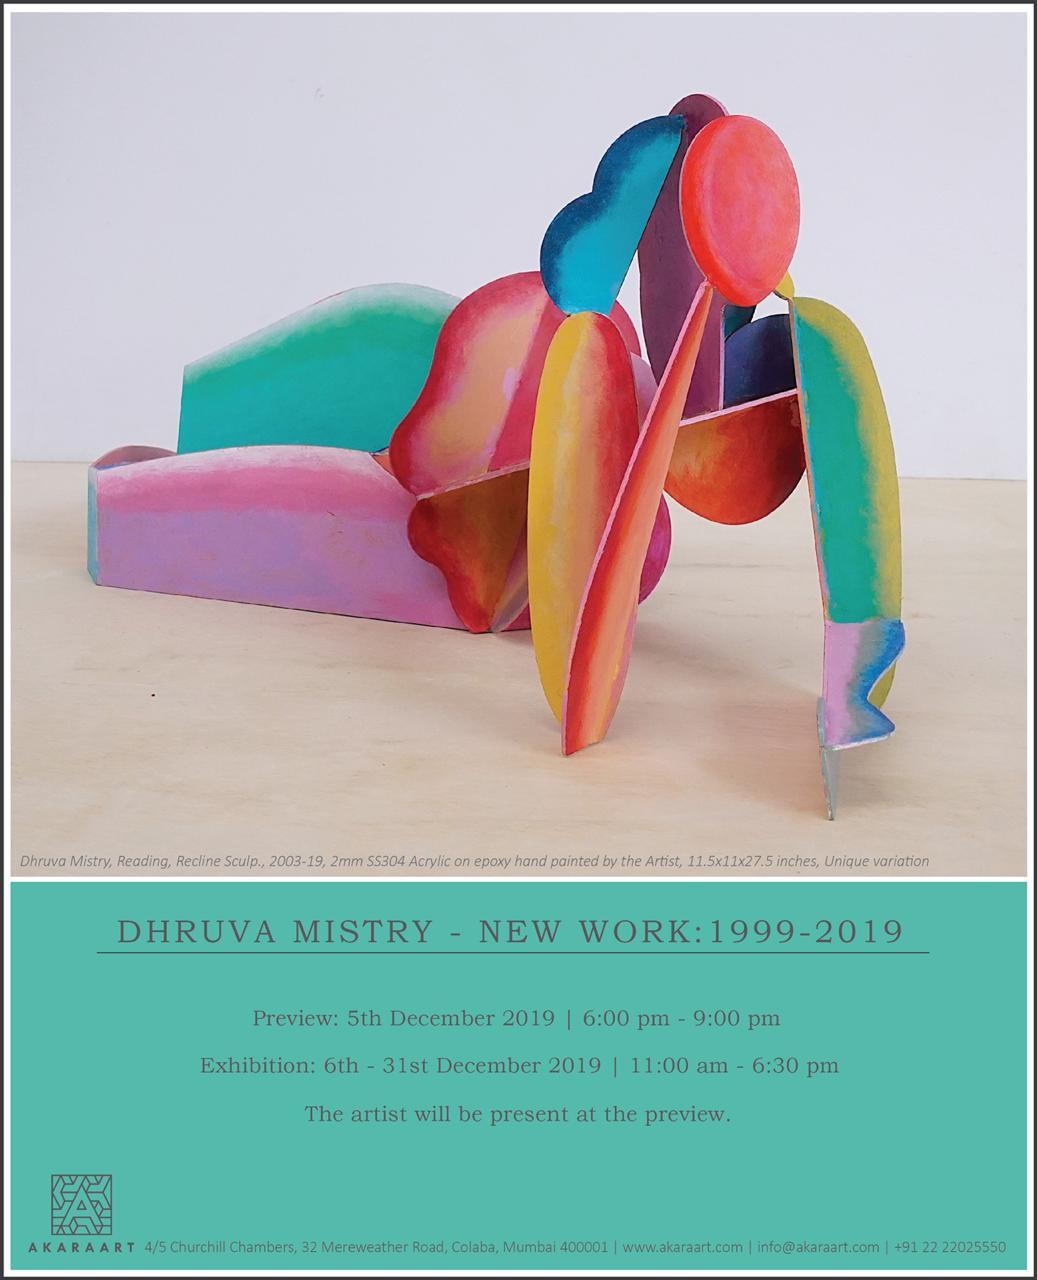 New Work: 1999 - 2019 by Dhruva Mistry